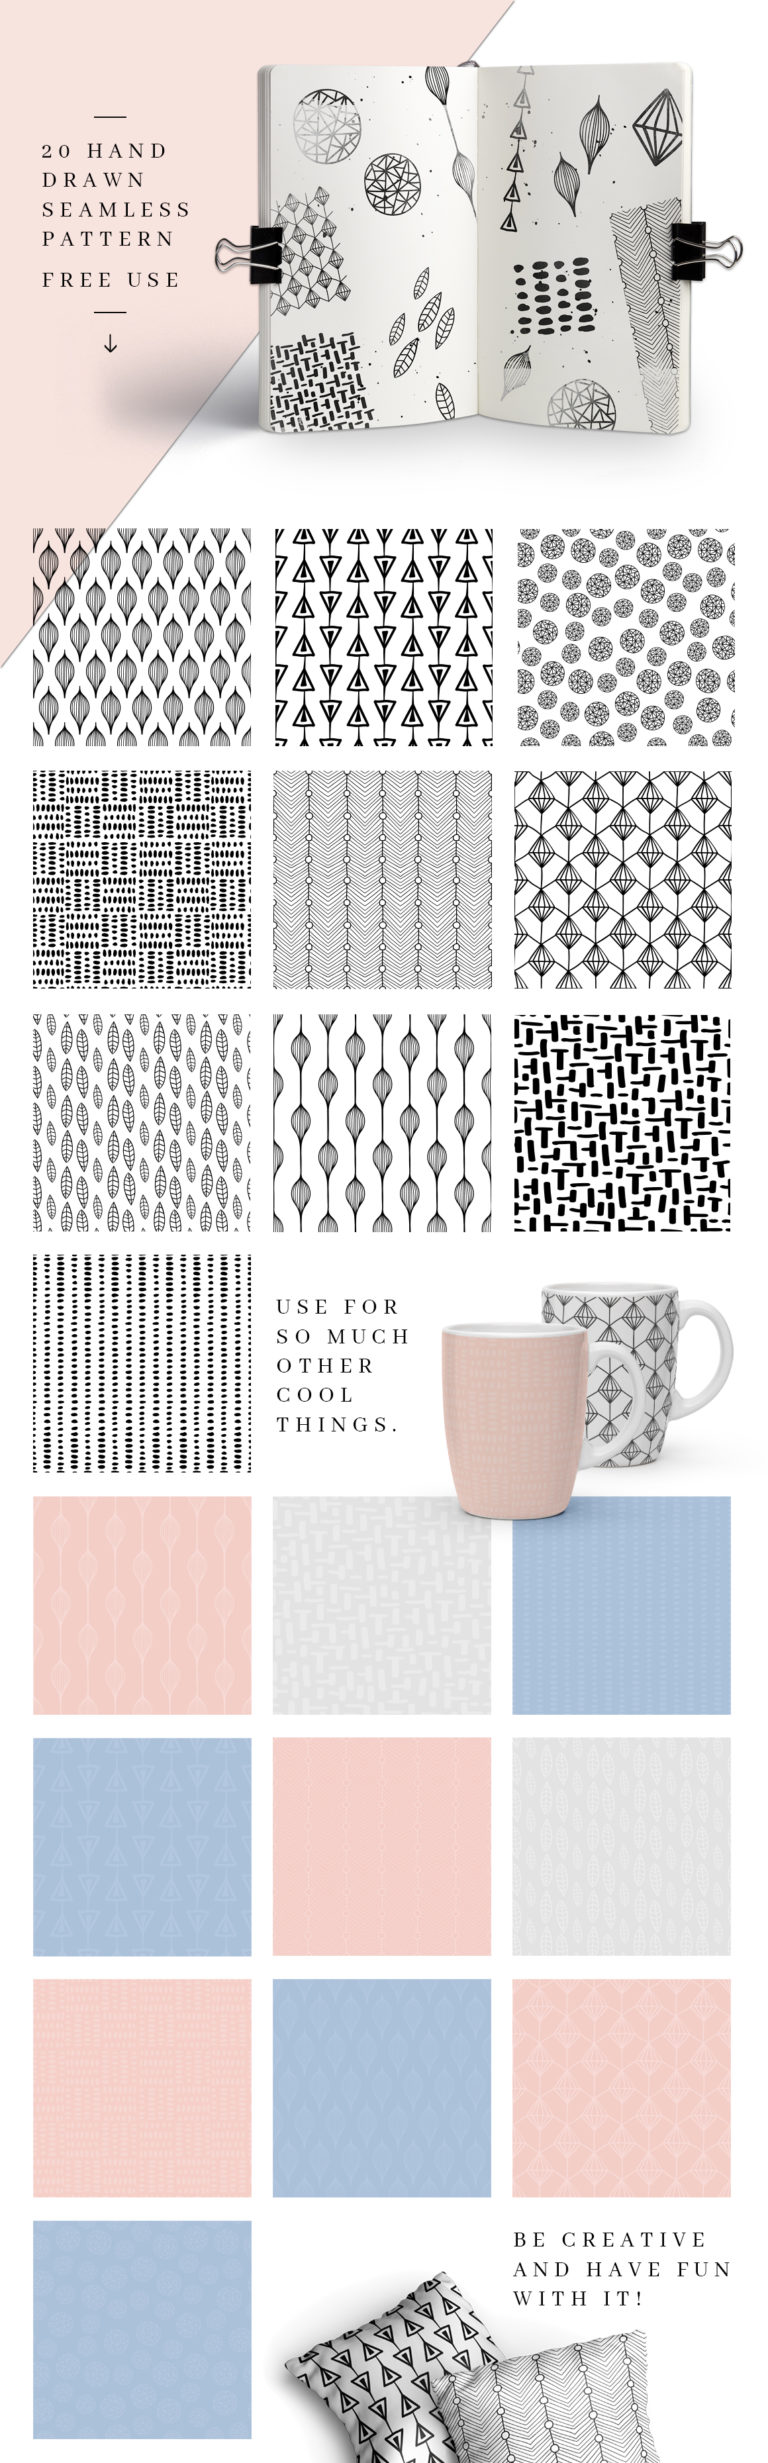 MALINA Business Cards + Logos + Seamless Patterns - 06 Unbenannt 7 scaled -